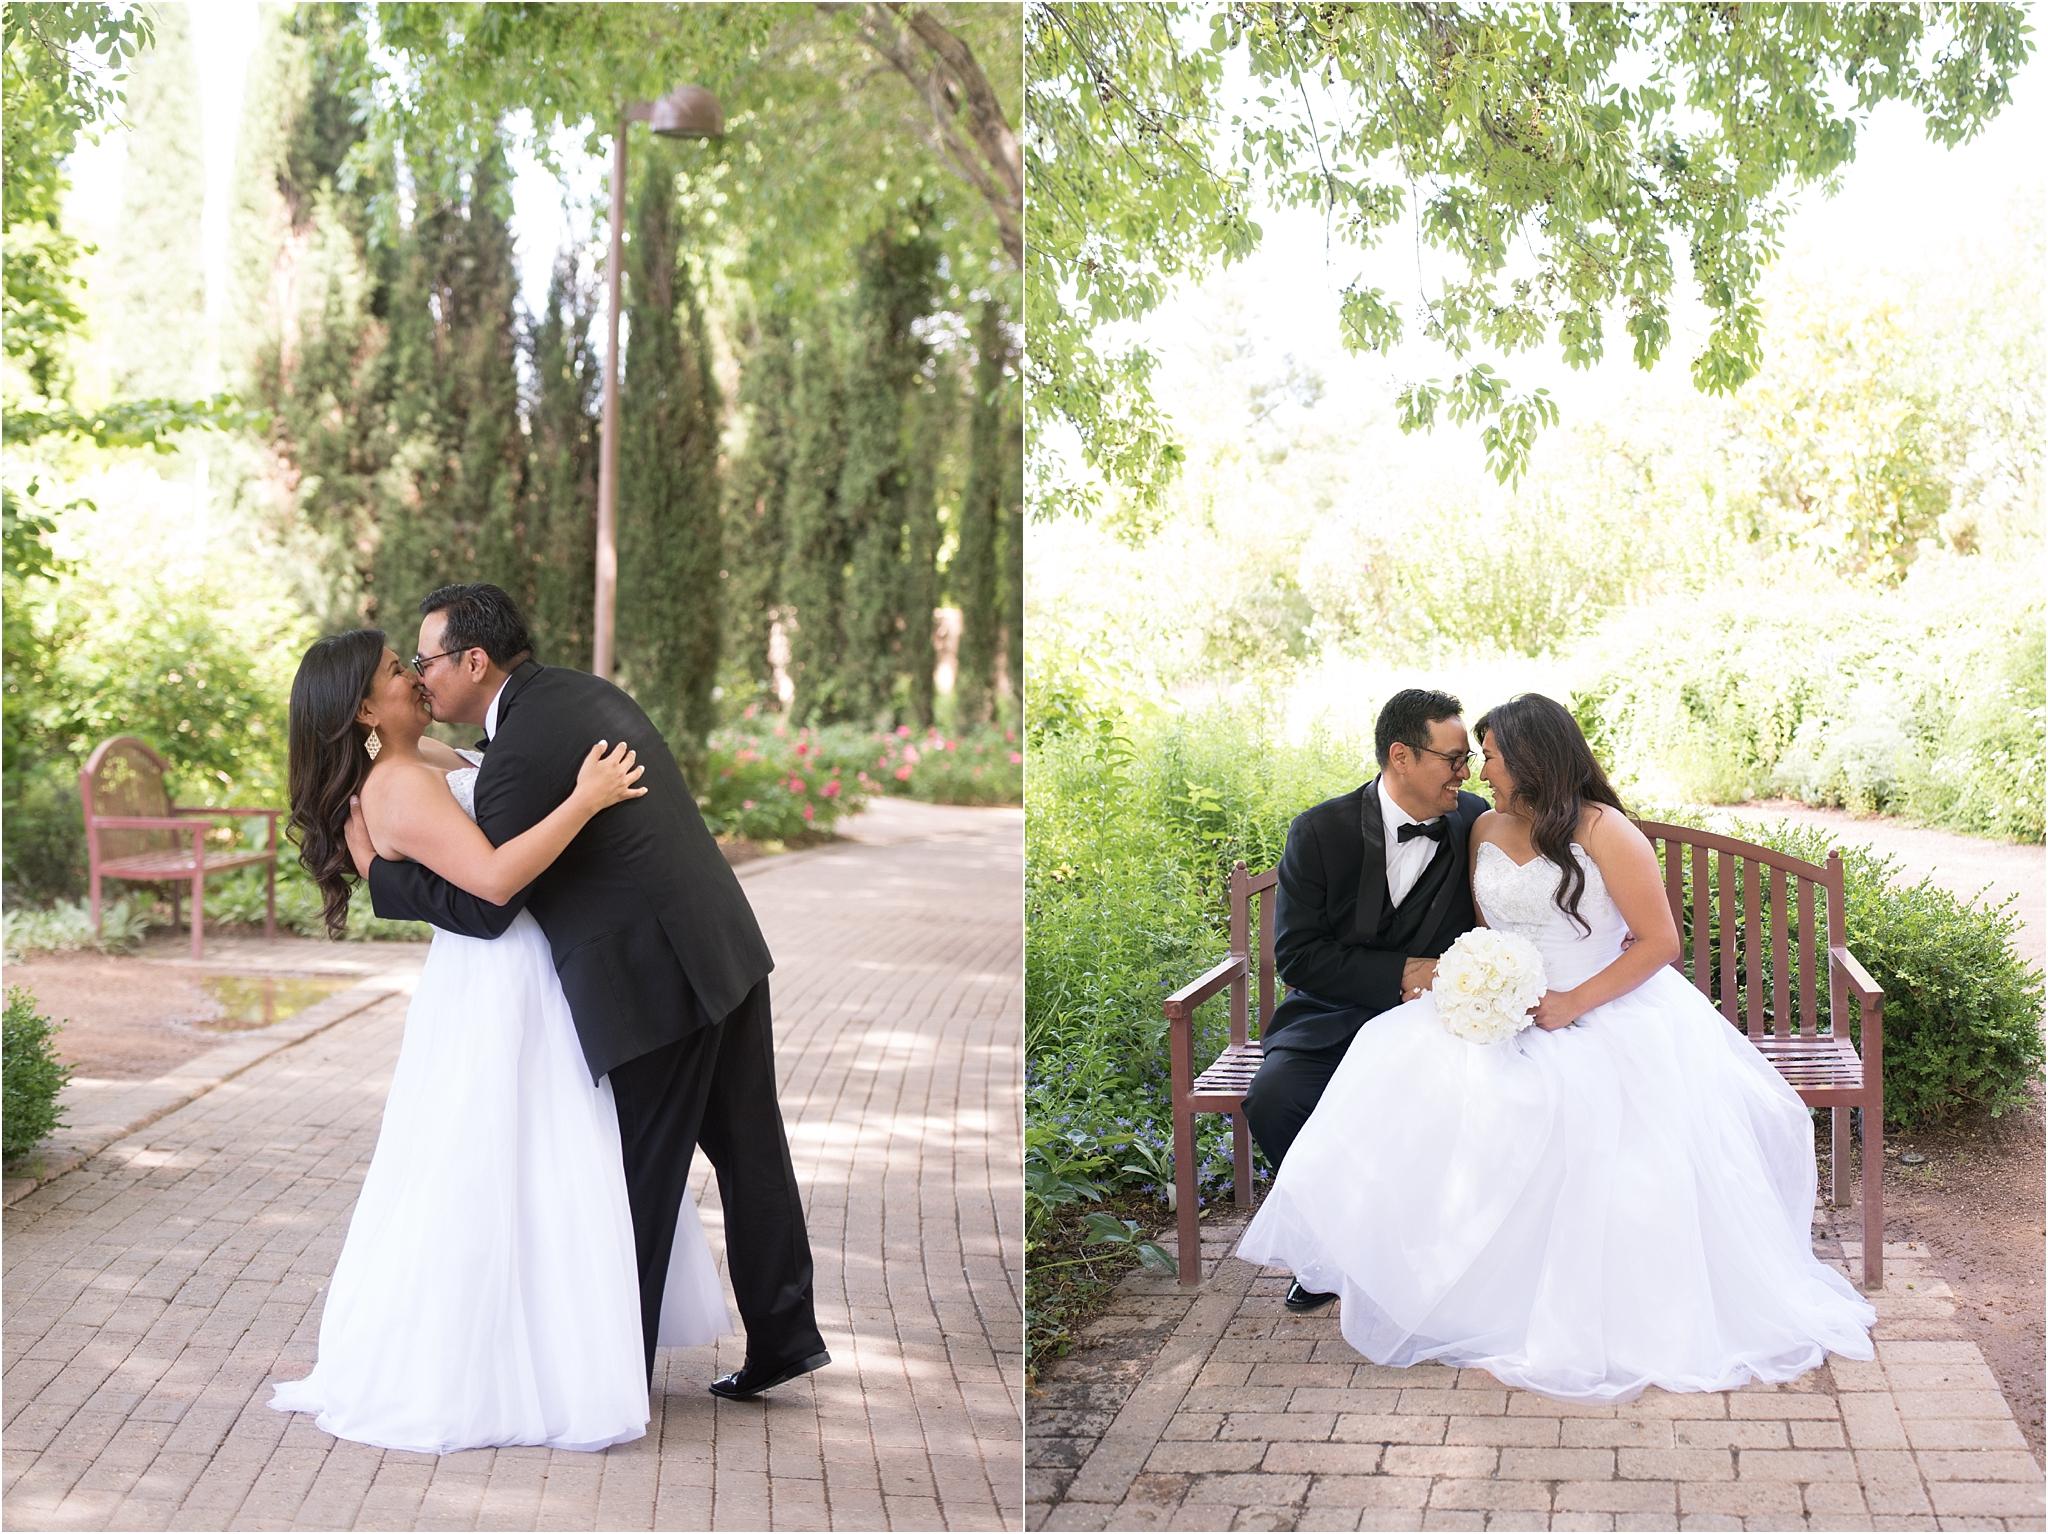 kayla kitts photography - albuquerque botanical gardens - albuquerque wedding photographer - albuquerque wedding - the banque lofts wedding_0007.jpg